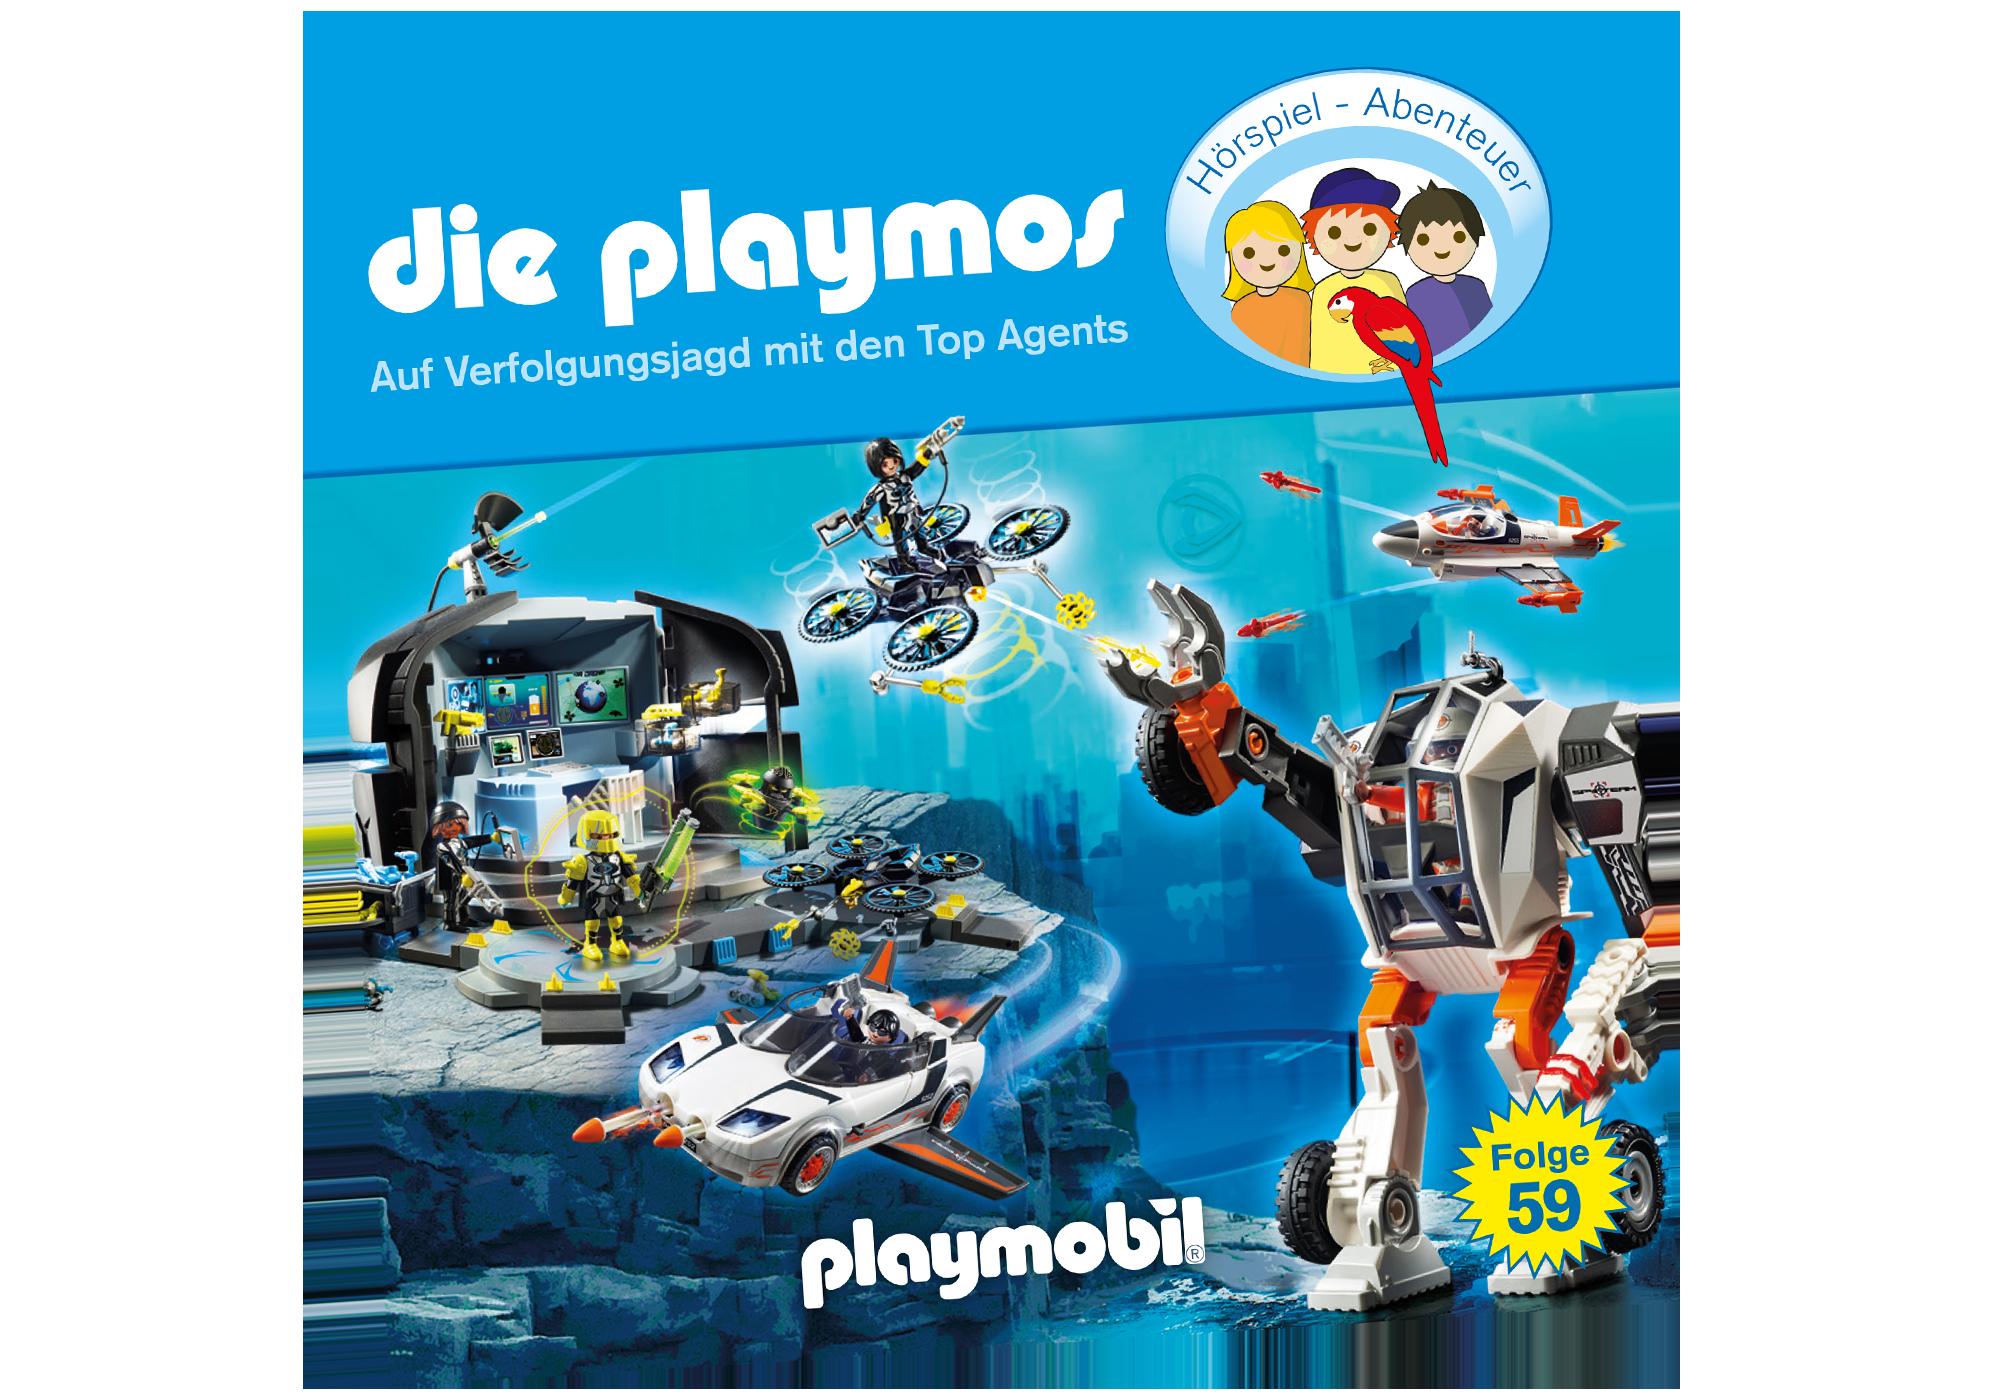 http://media.playmobil.com/i/playmobil/80061_product_detail/Auf Verfolgungsjagd mit den Top Agents - Folge 59